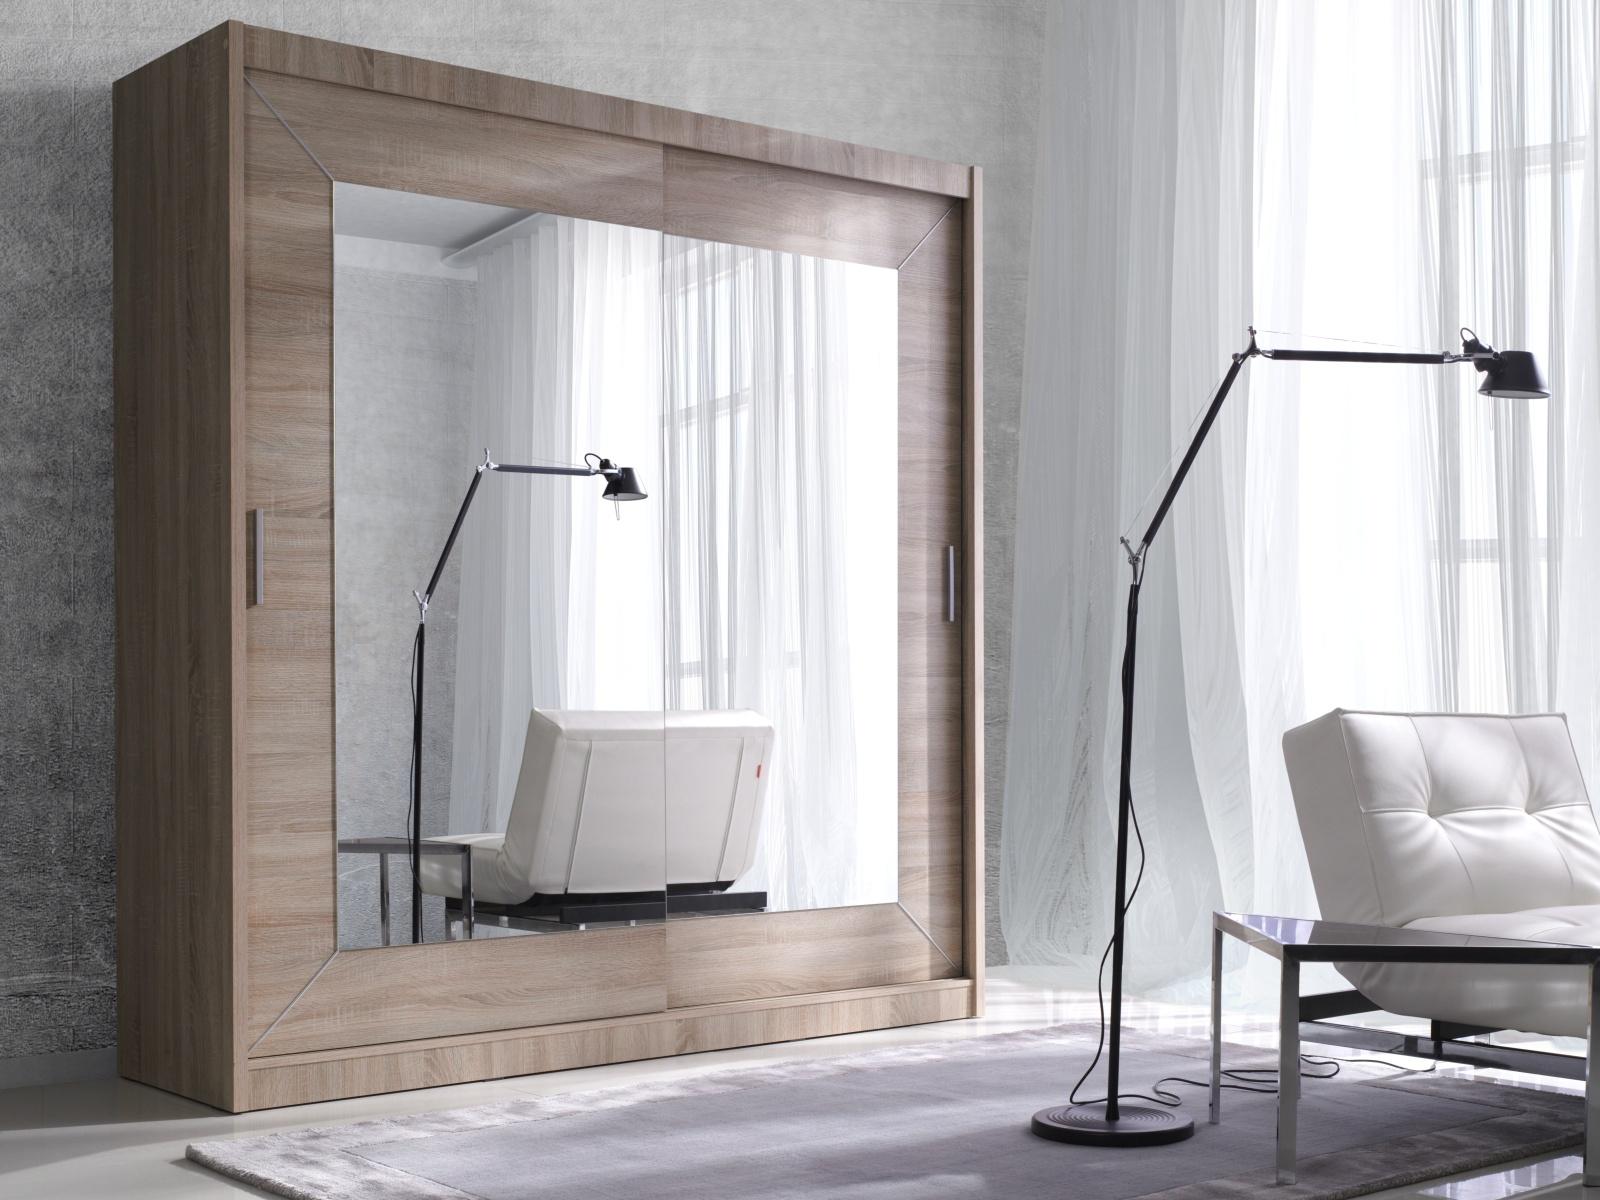 Smartshop ALFA šatní skříň se zrcadlem 180 TYP 17, dub sonoma světlý